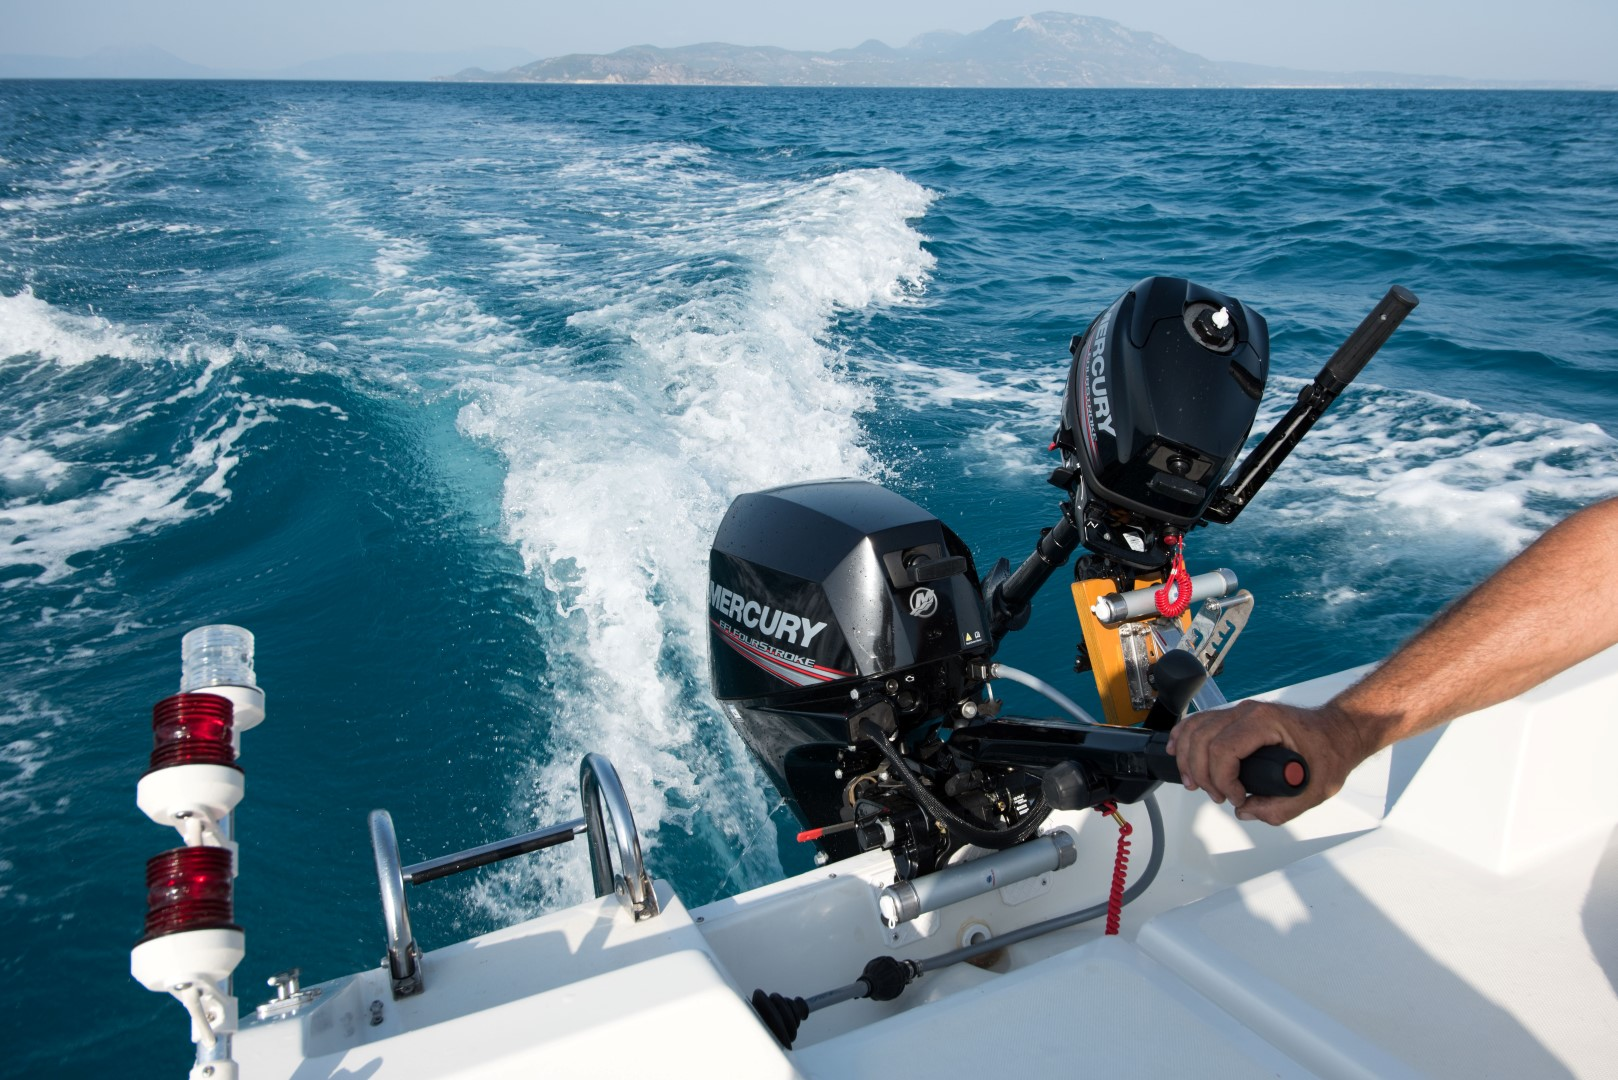 No licence boat rental for fishing around Kiato